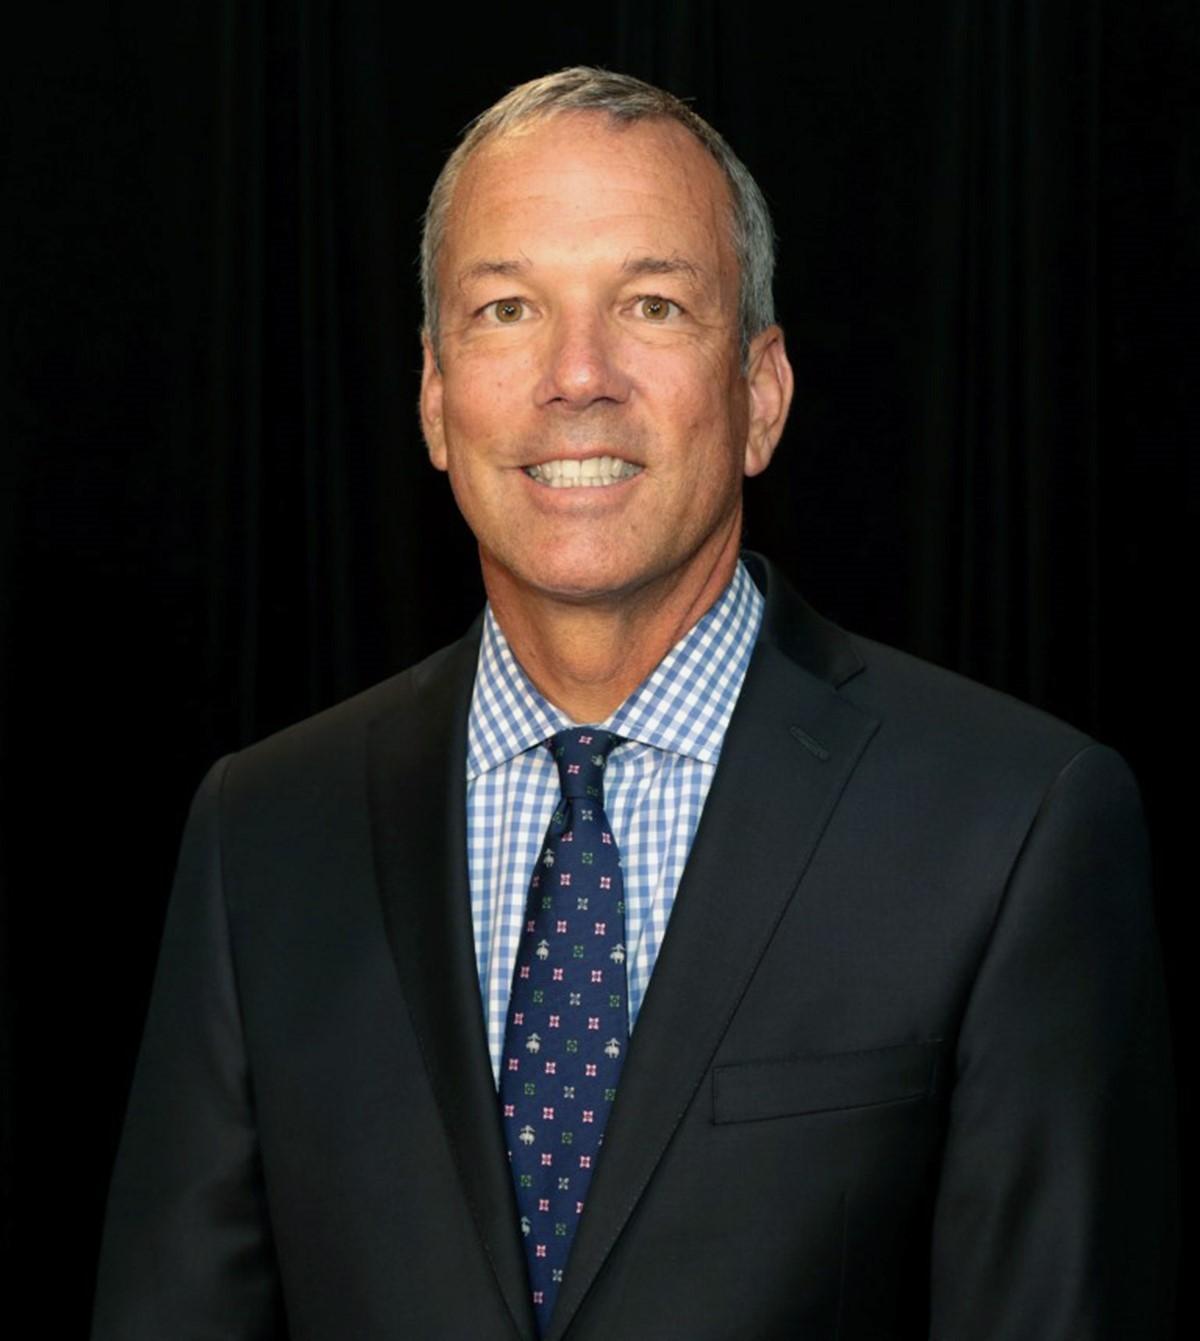 Target Names Jeff Burt Senior Vice President, Grocery, Fresh Food and Beverage (Photo: Target Corporation).